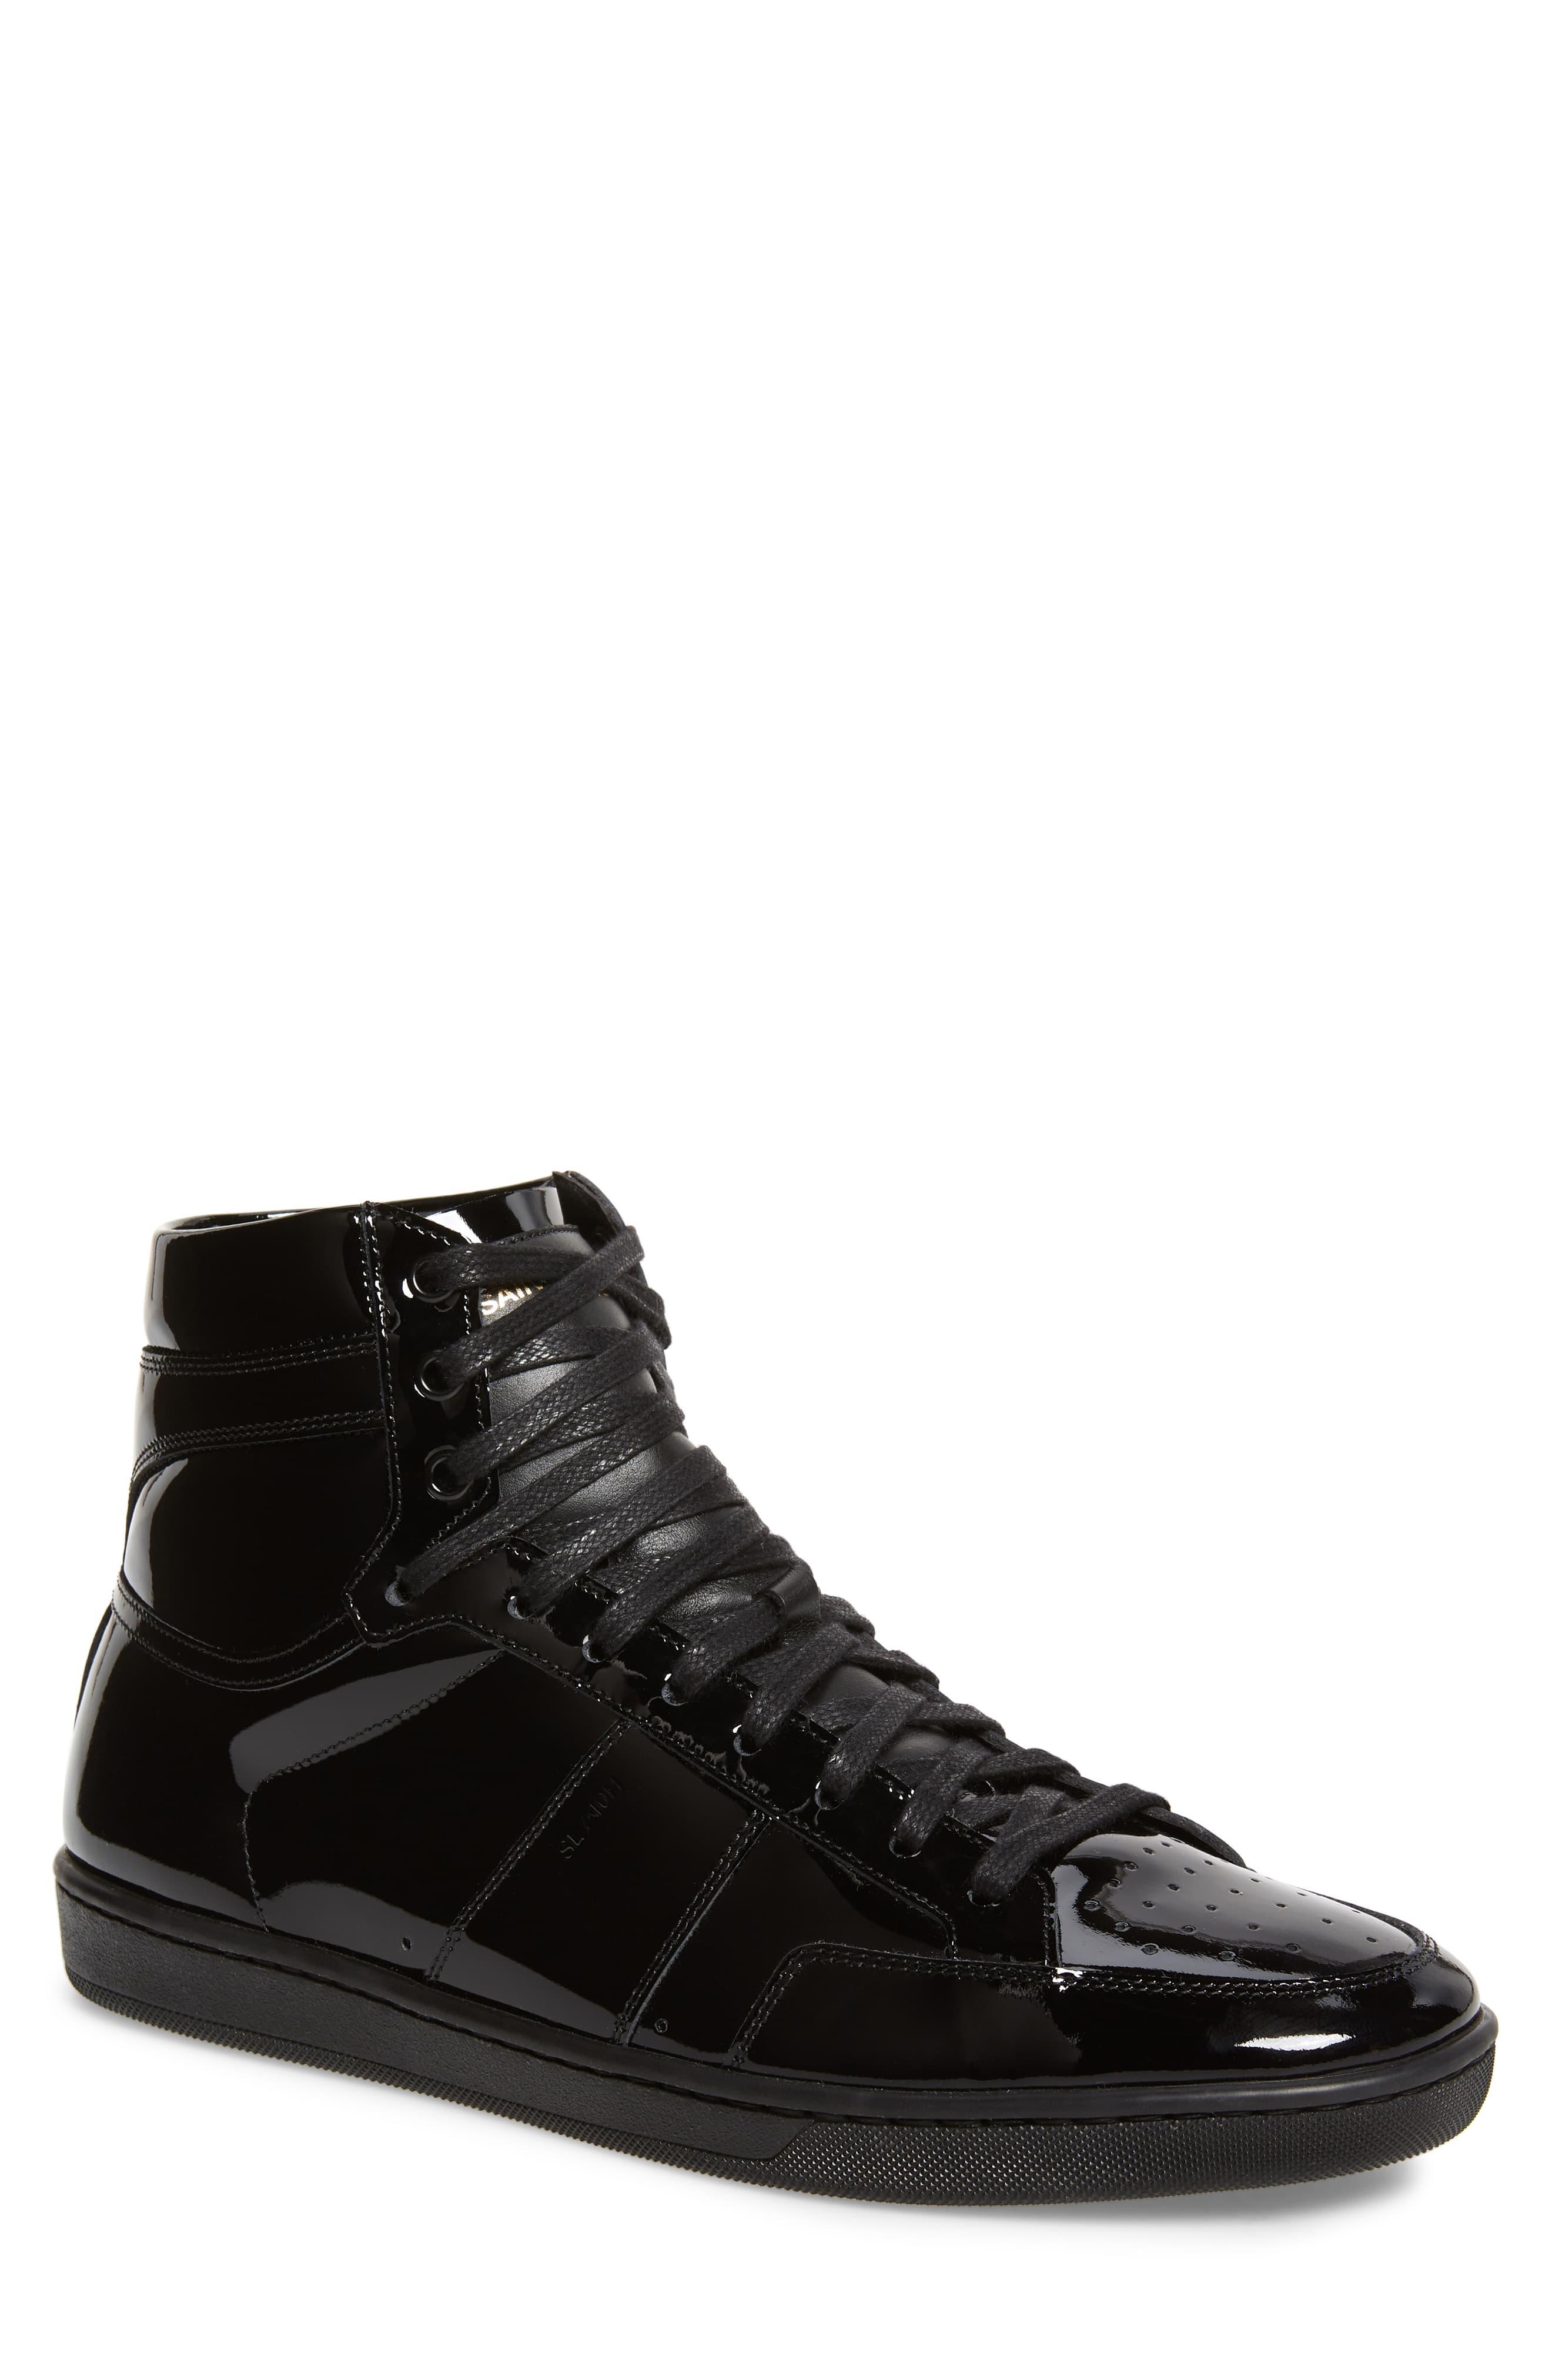 4a615a96 Men's Saint Laurent Sl/10H Signature Court Classic High Top Sneaker, Size  6US / 39EU - Black